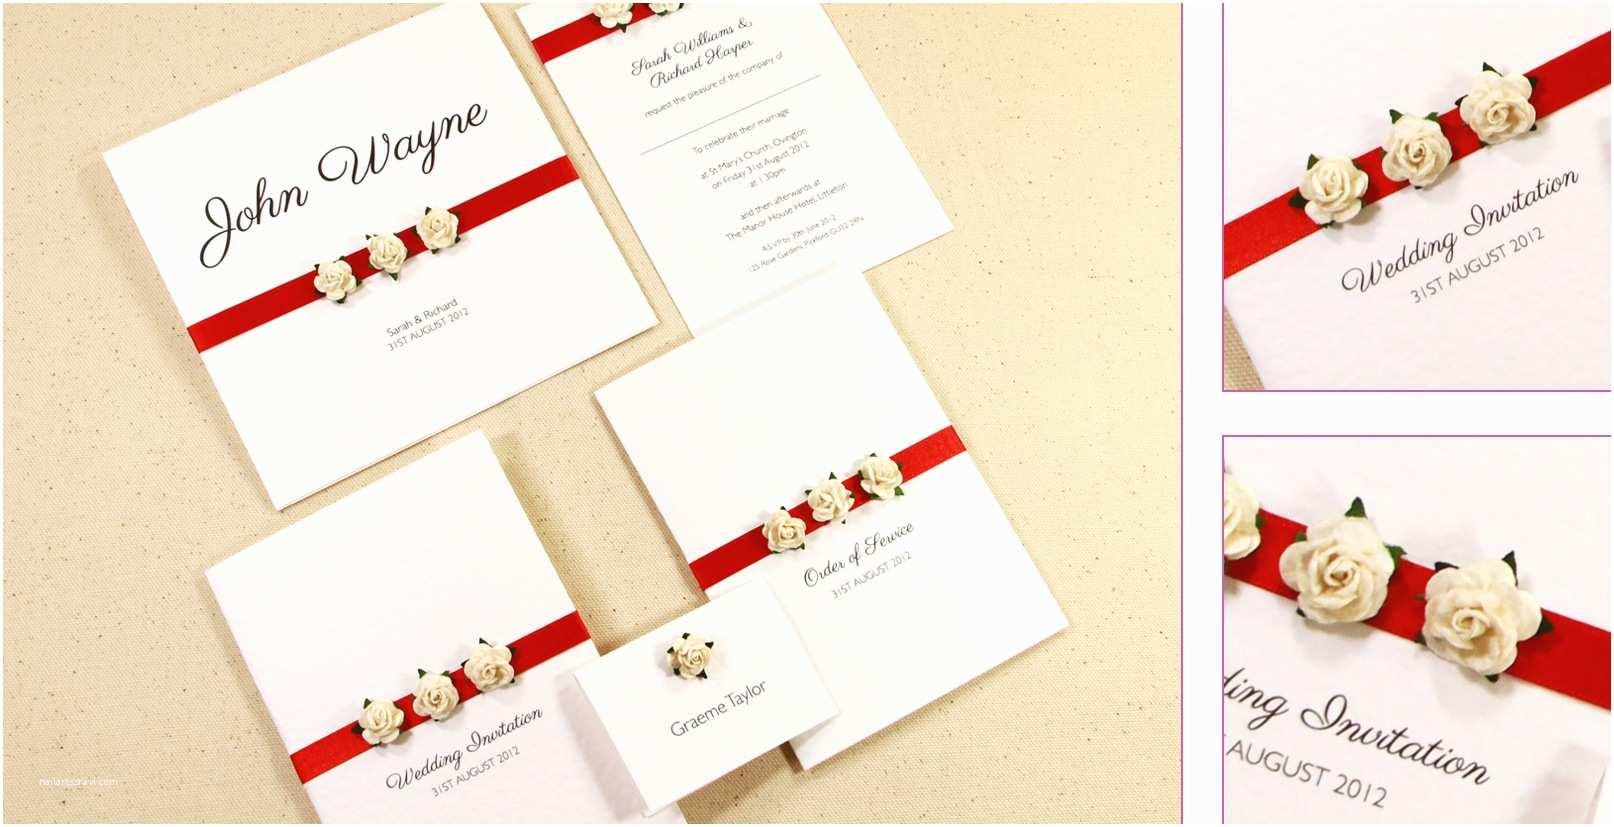 Custom Made Wedding Invitations 13 Wedding Invitation Designs Design Wedding